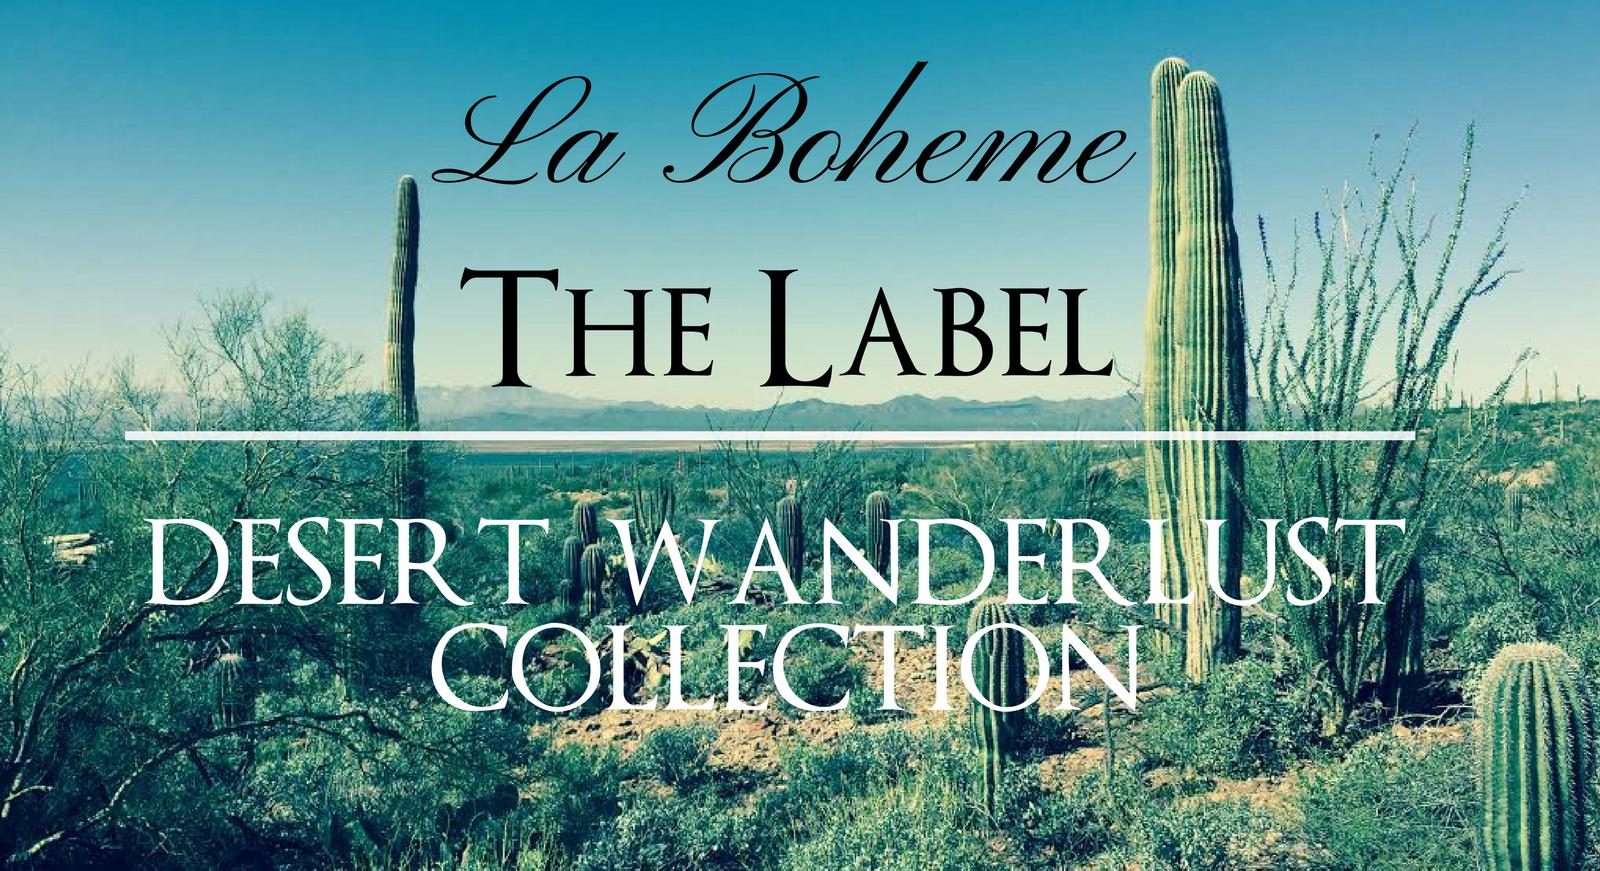 Desert Wanderlust Collection